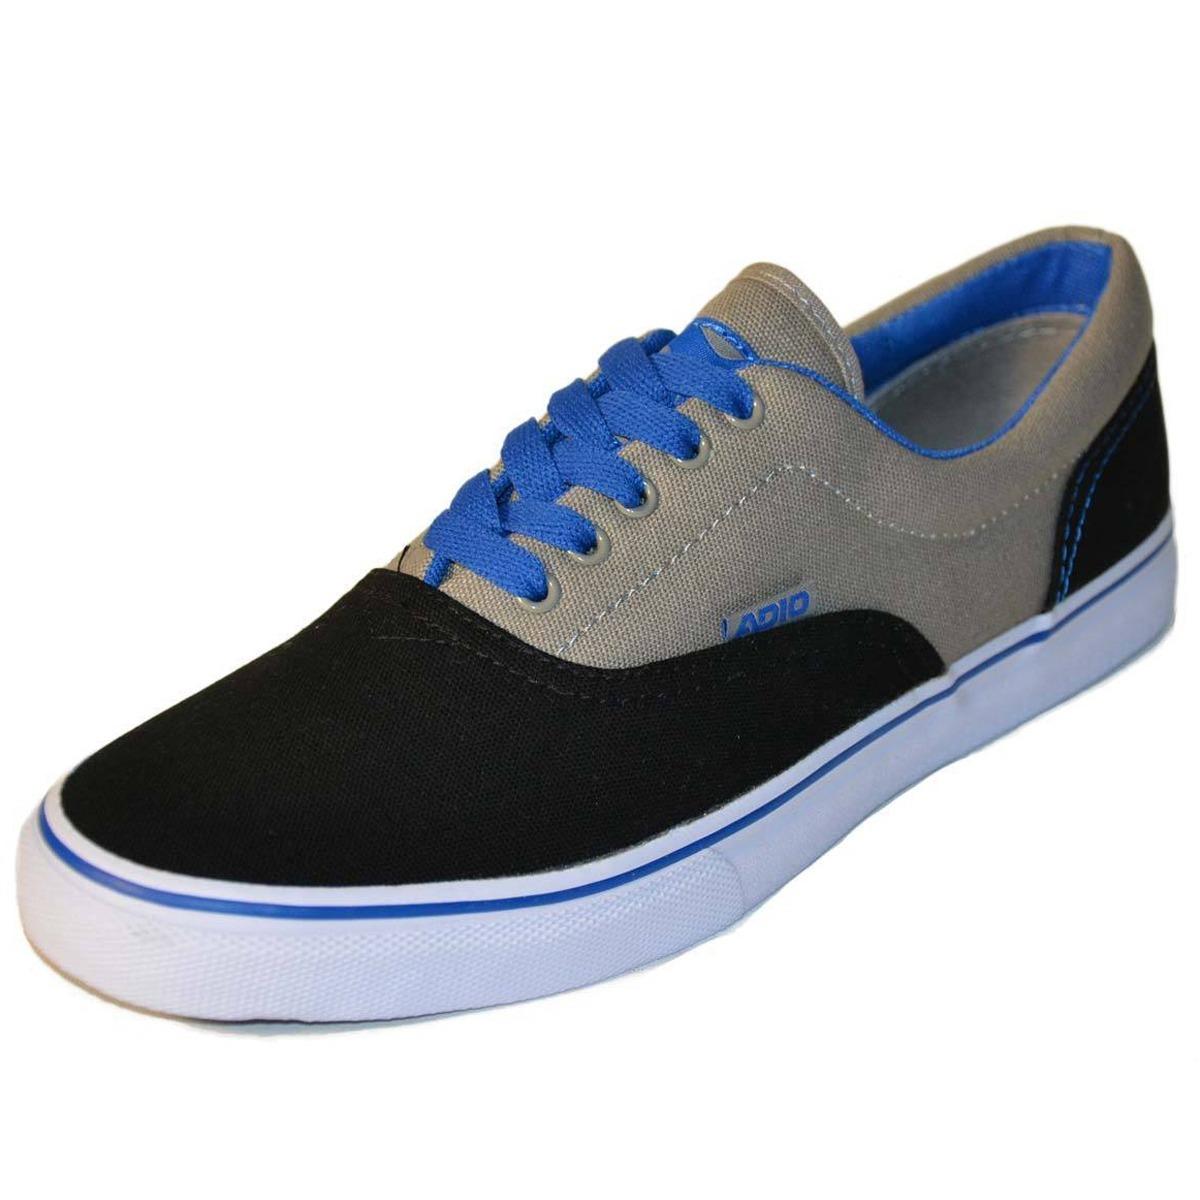 Tenis Adio Cruiser Gris Azul Skate Casual Vans Dc -   899.00 en ... a38fa4a2557